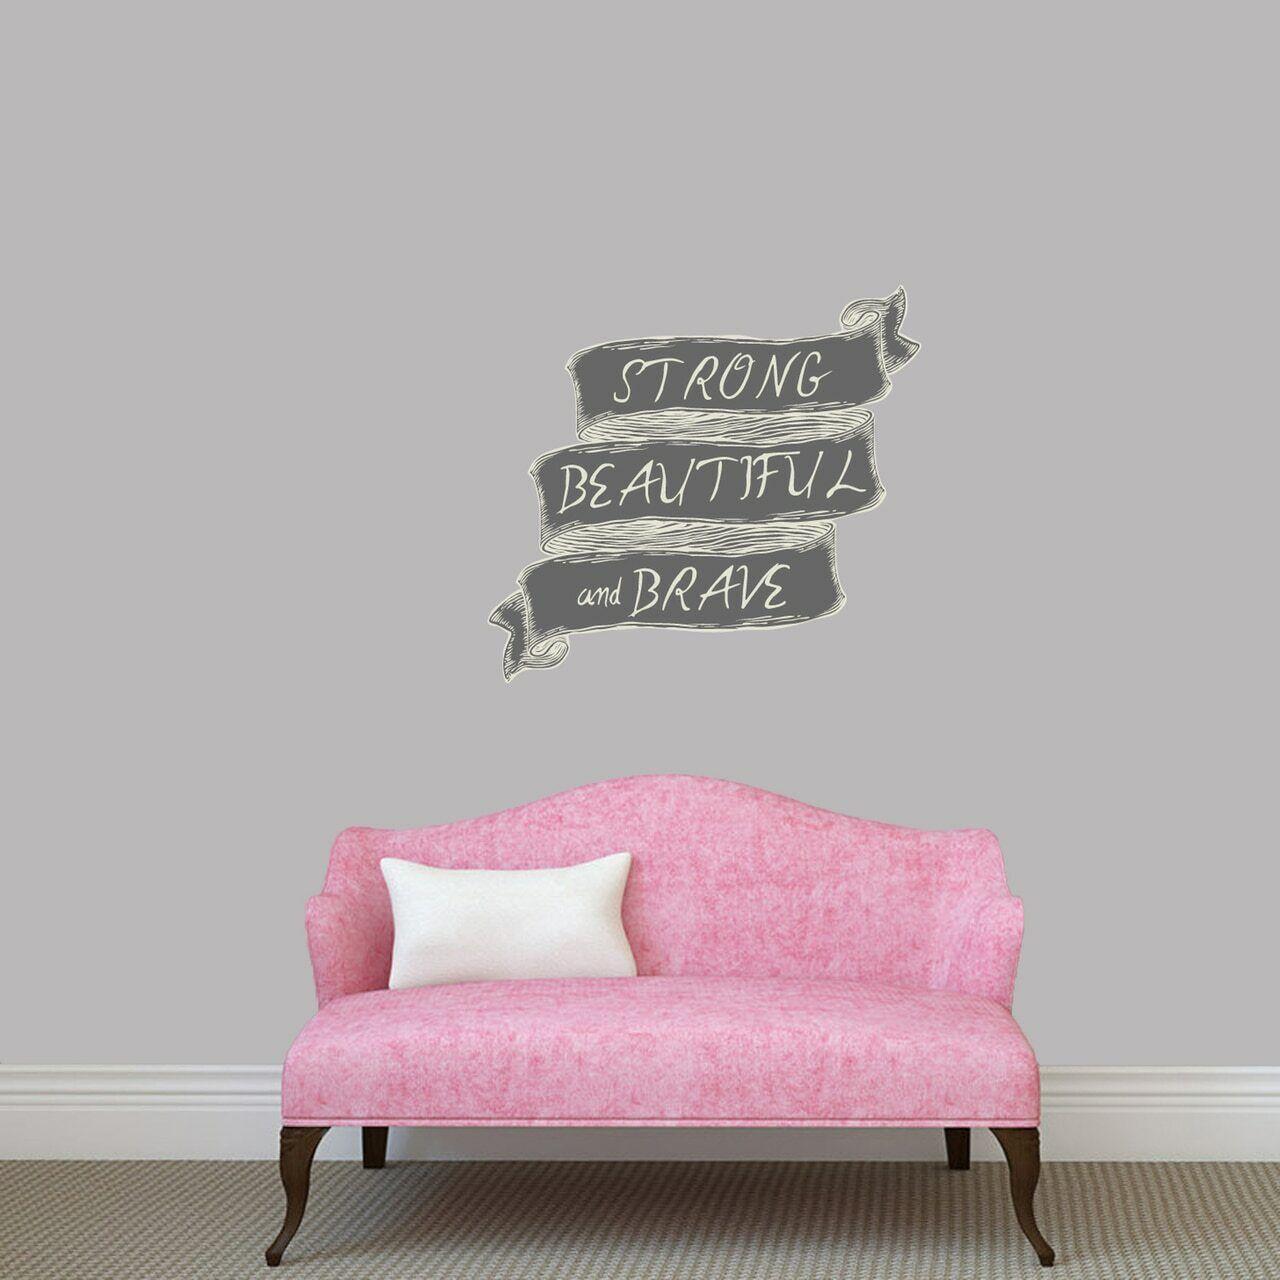 Strong Beautiful Beautiful Beautiful and Brave Printed Wall Decal - Kids, Teens, Bedroom, Office 30daa2